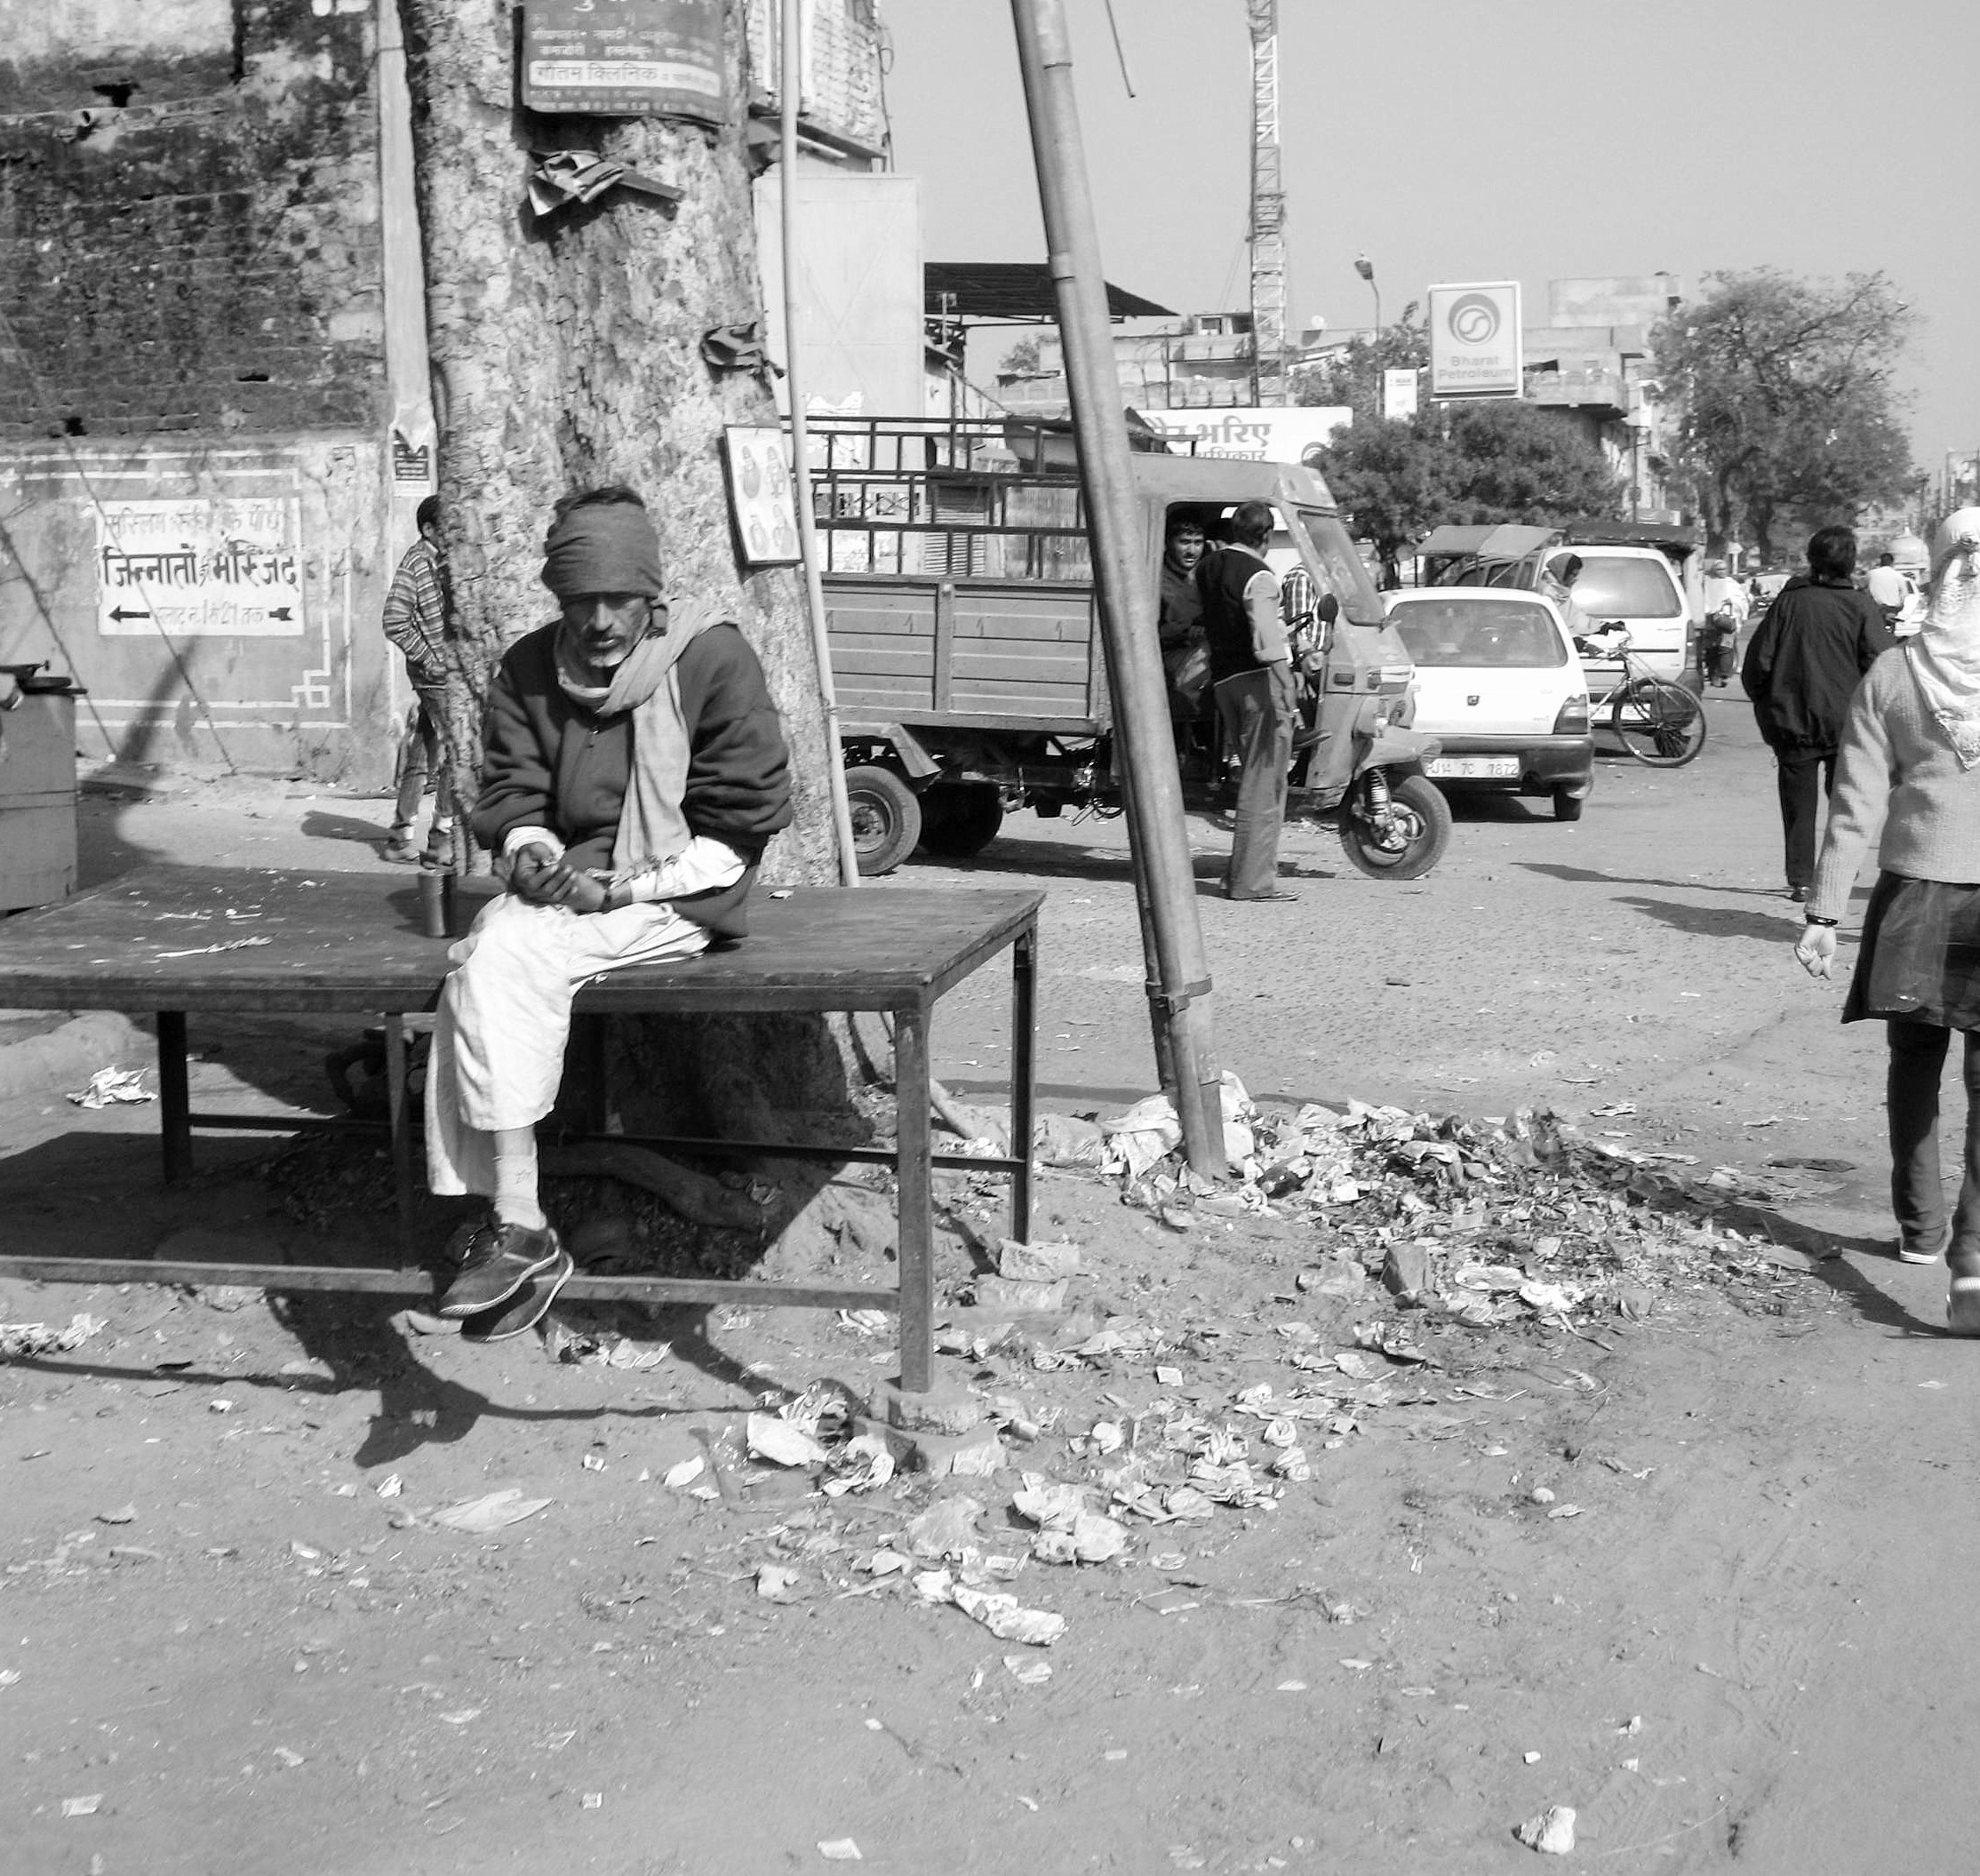 india-street image (2).JPG